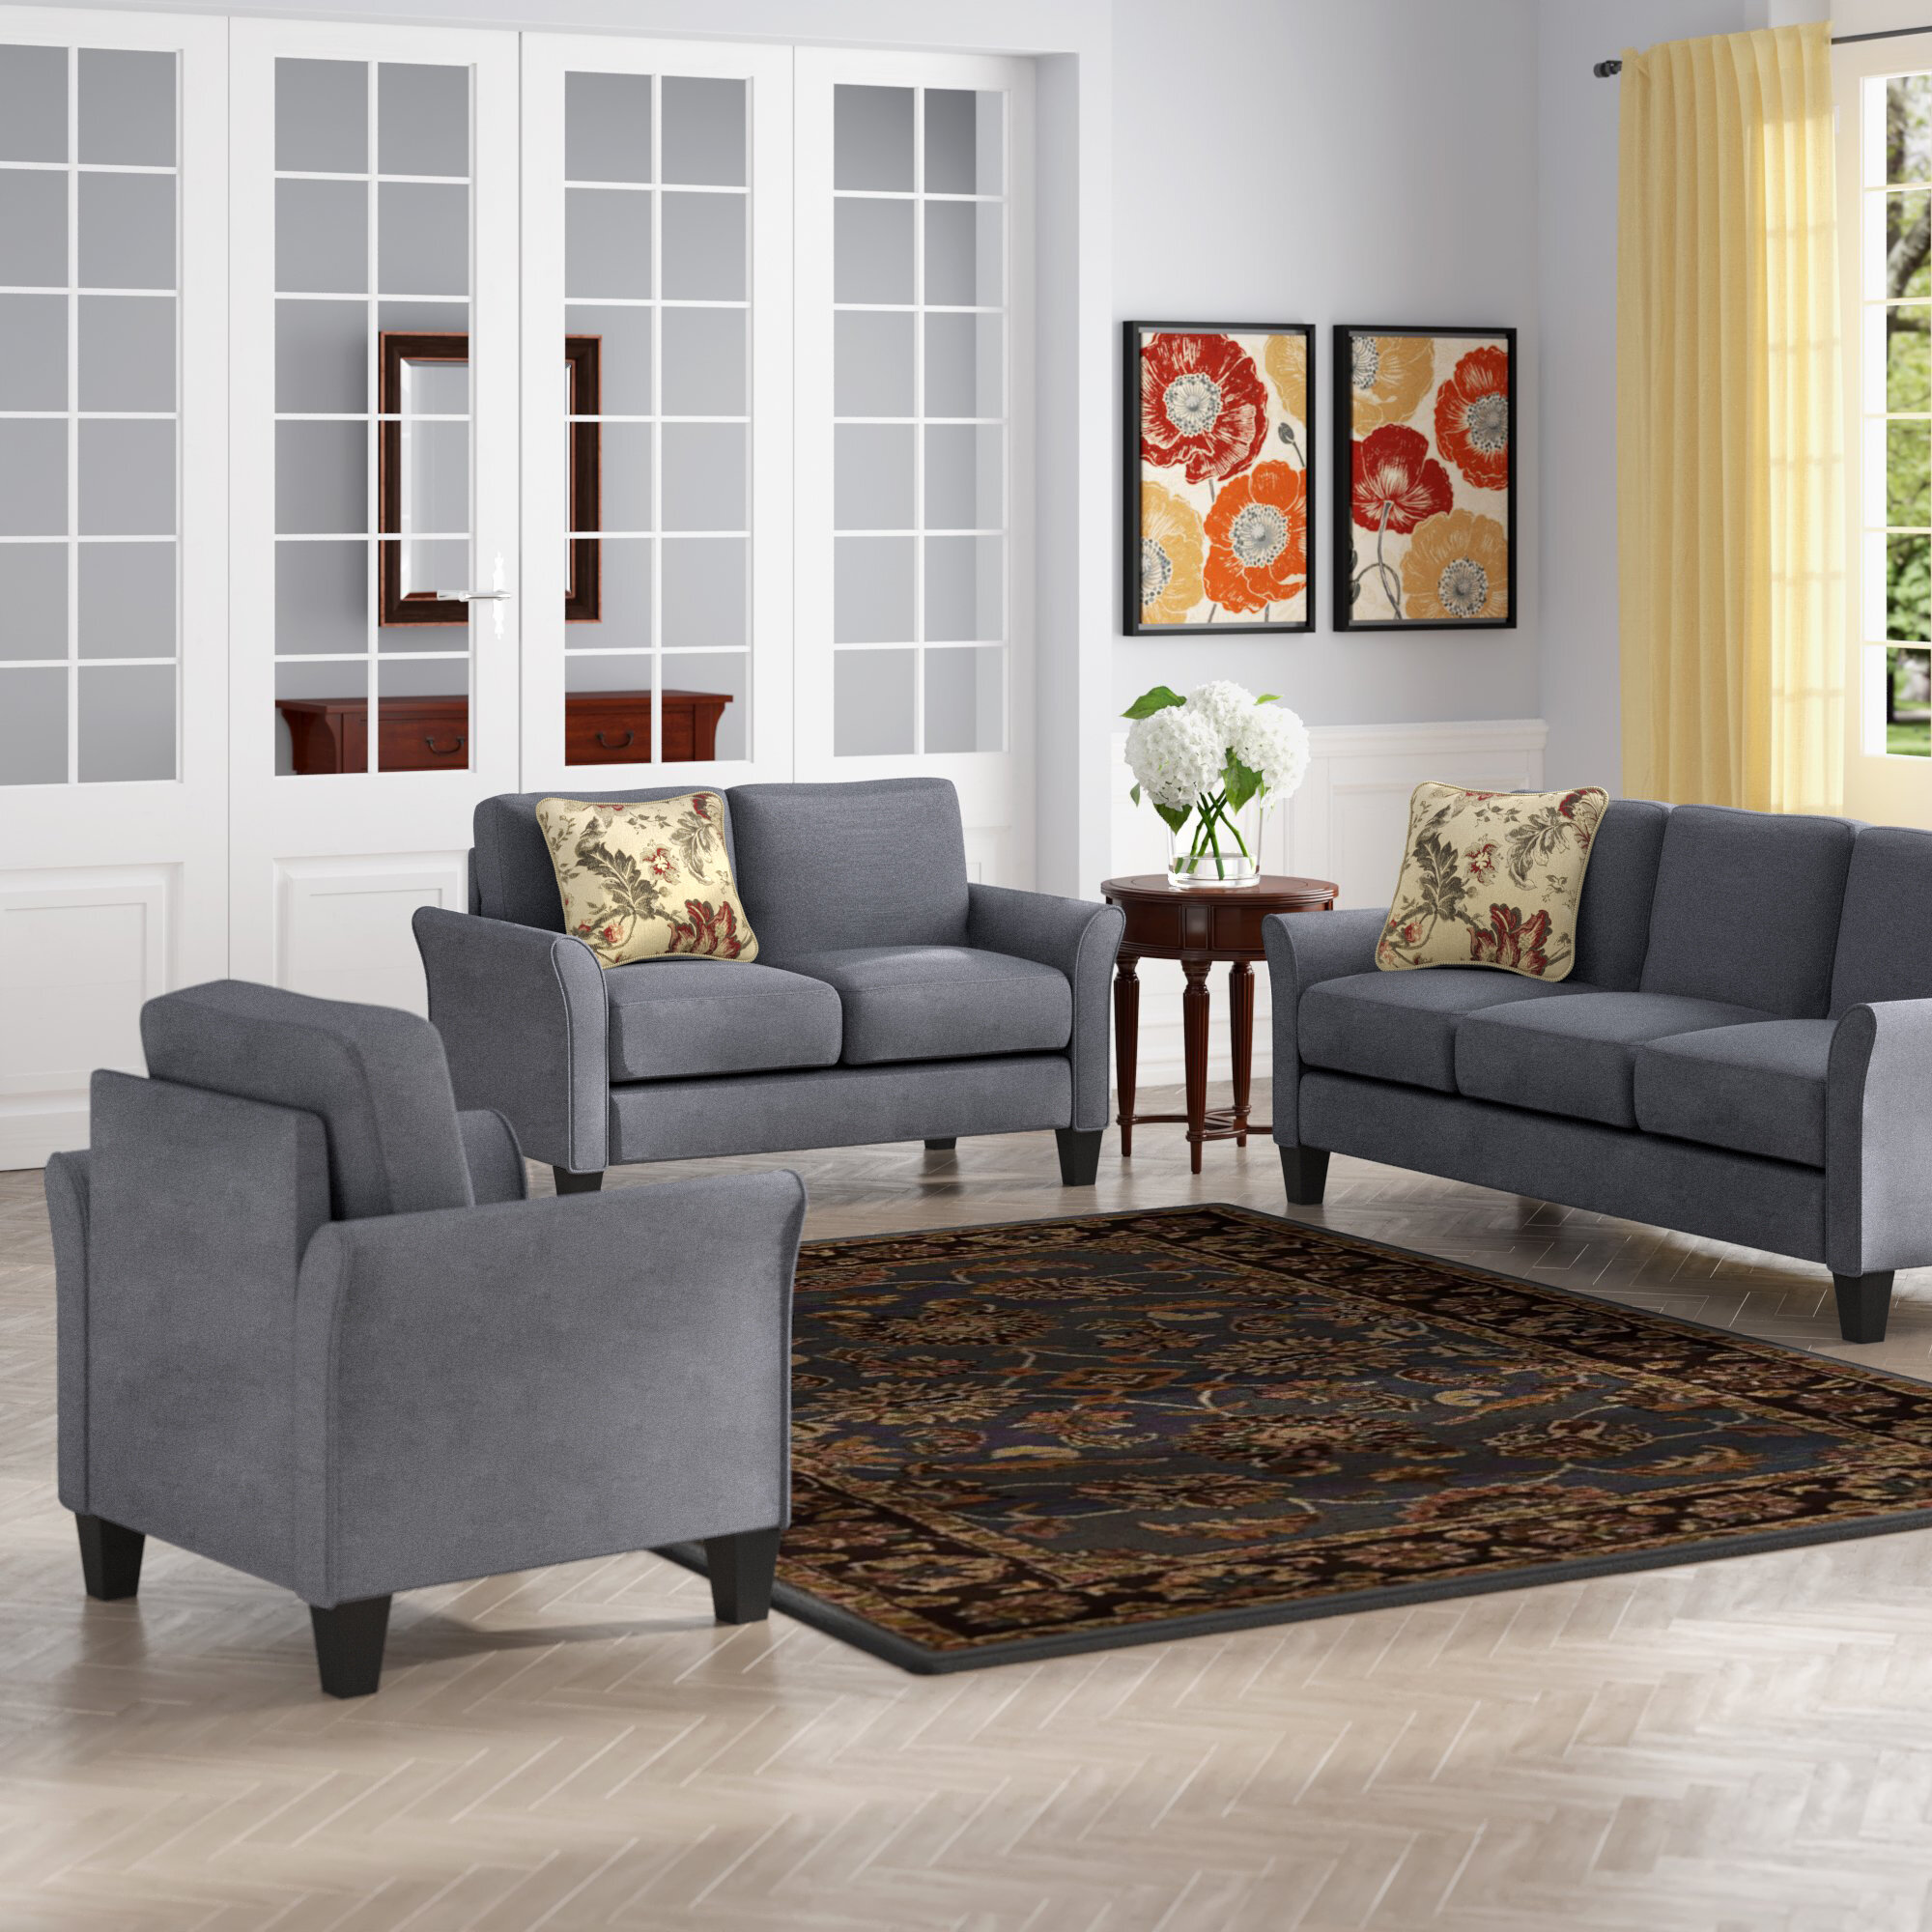 3 Piece Living Room Sets | Wayfair